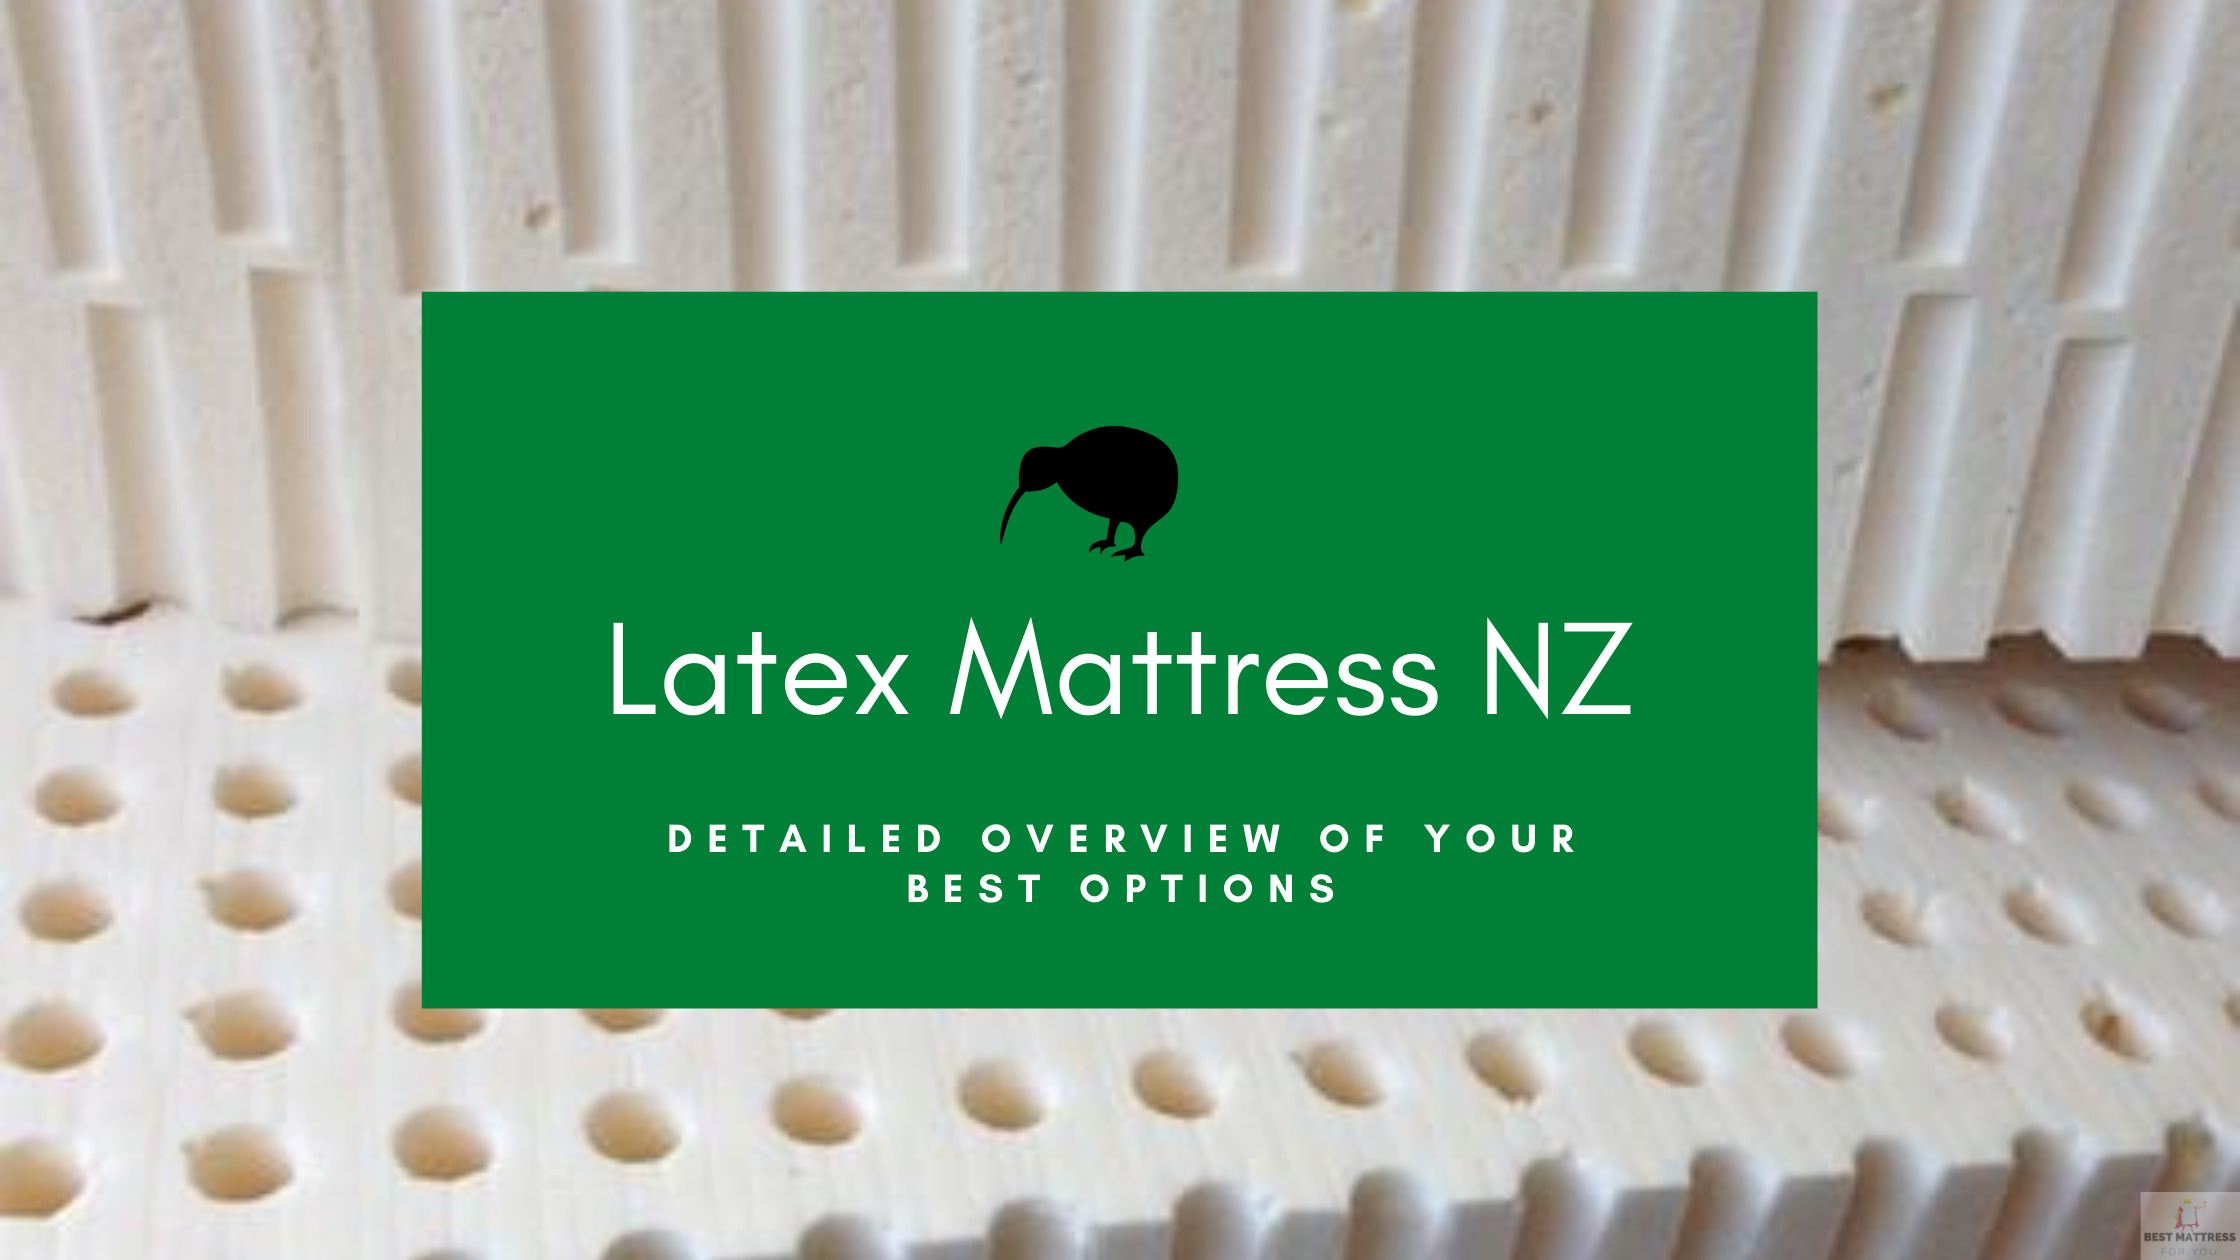 Latex Mattress NZ - Cover Image